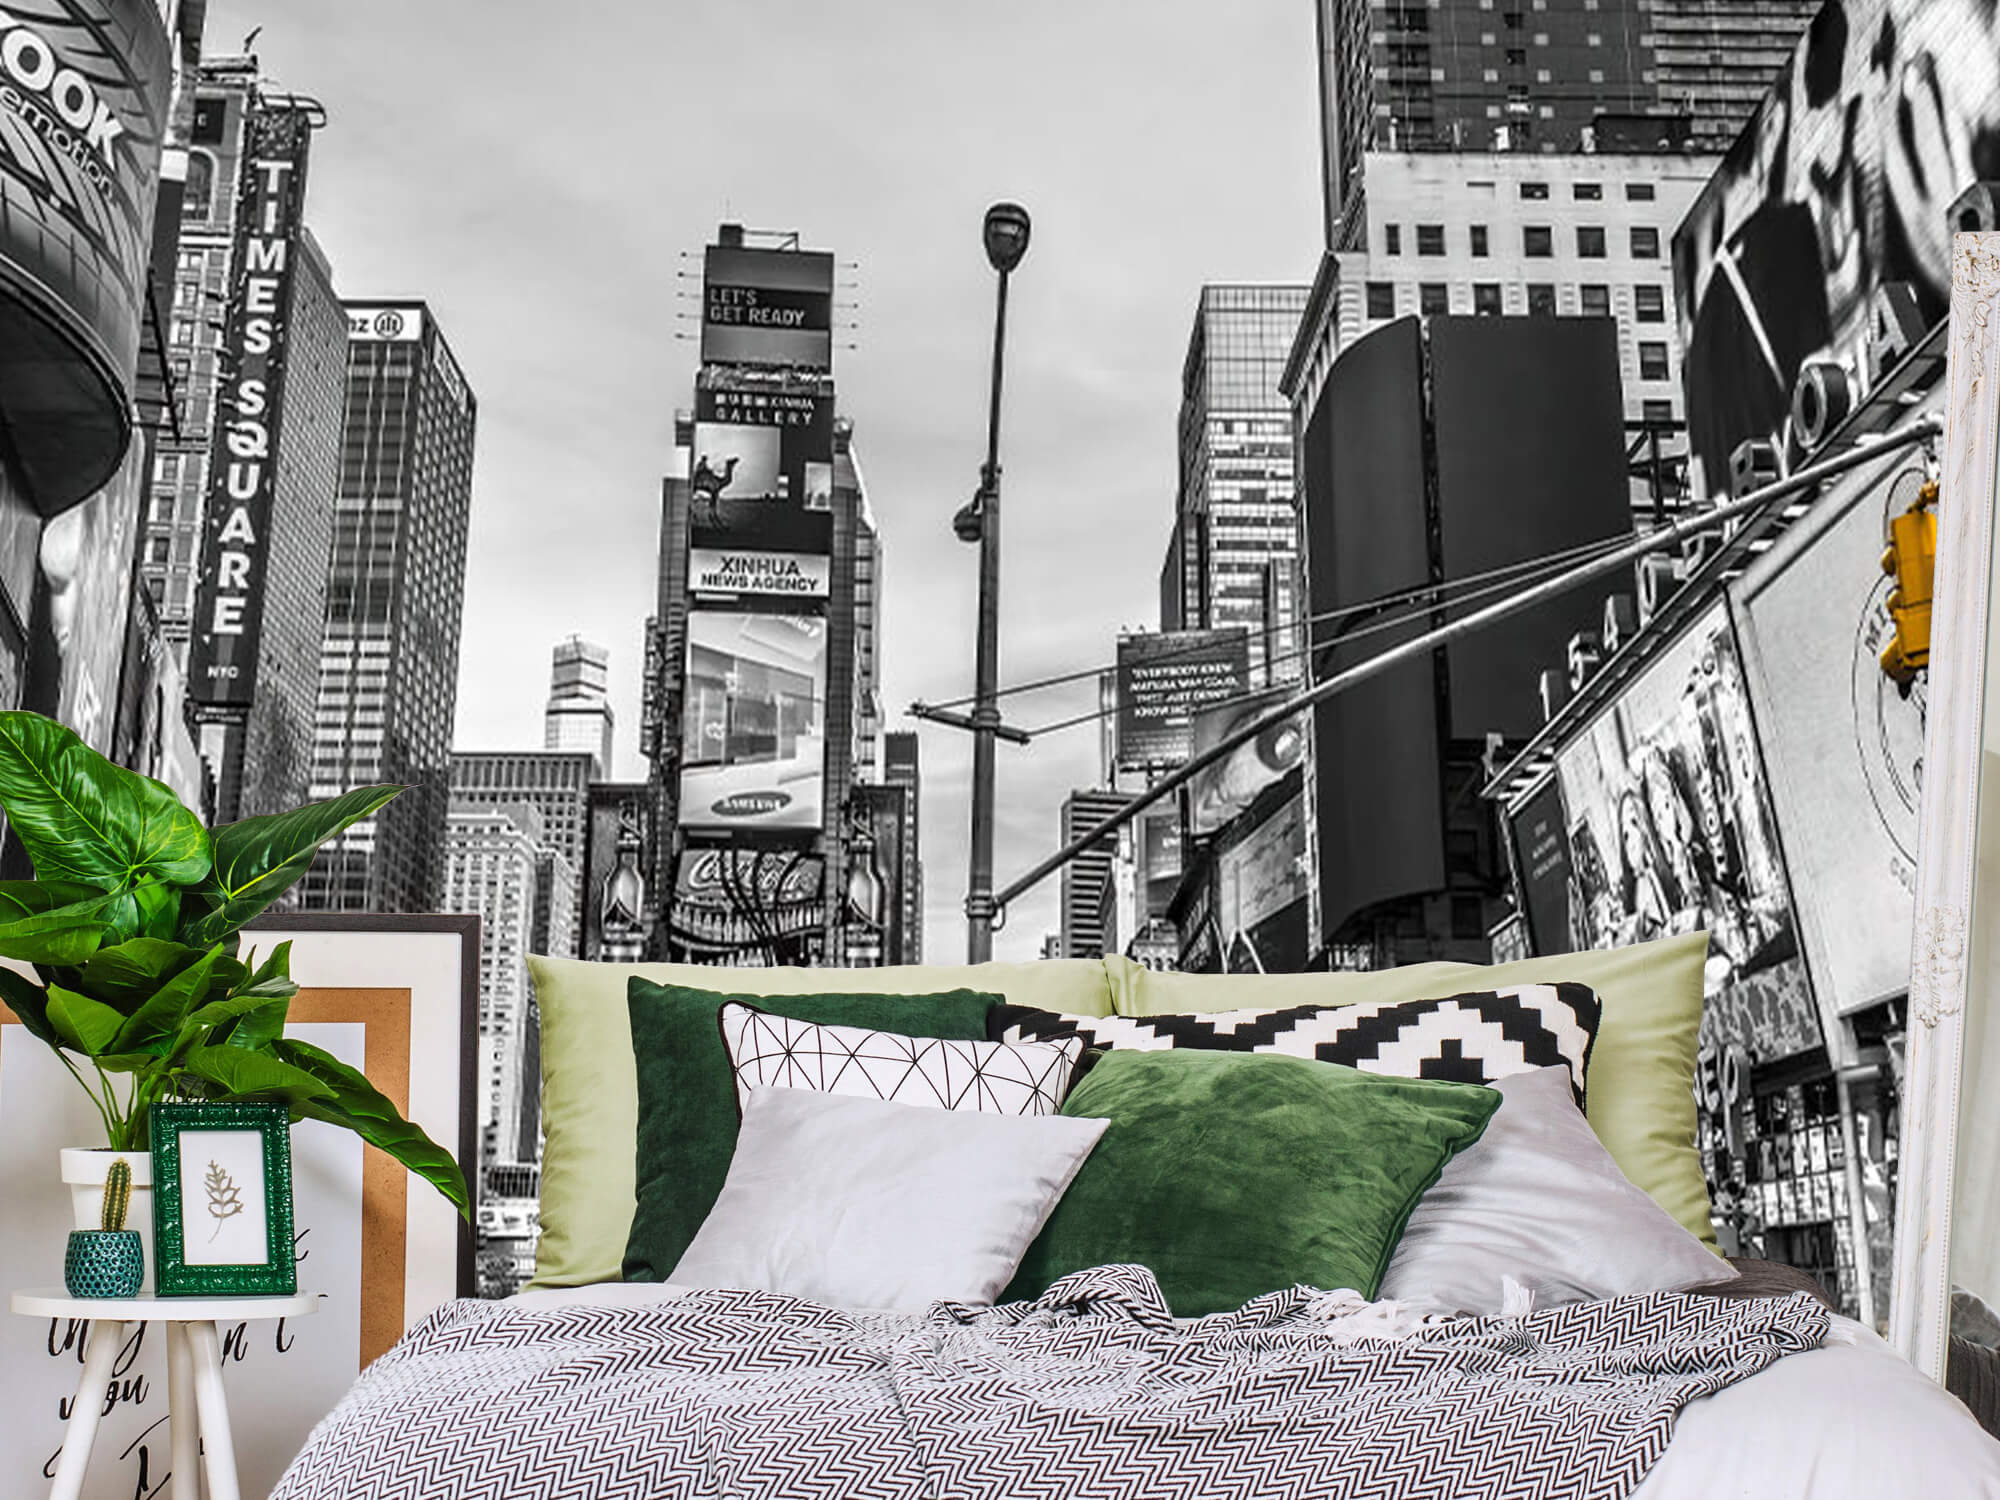 Broadway Times Square 9